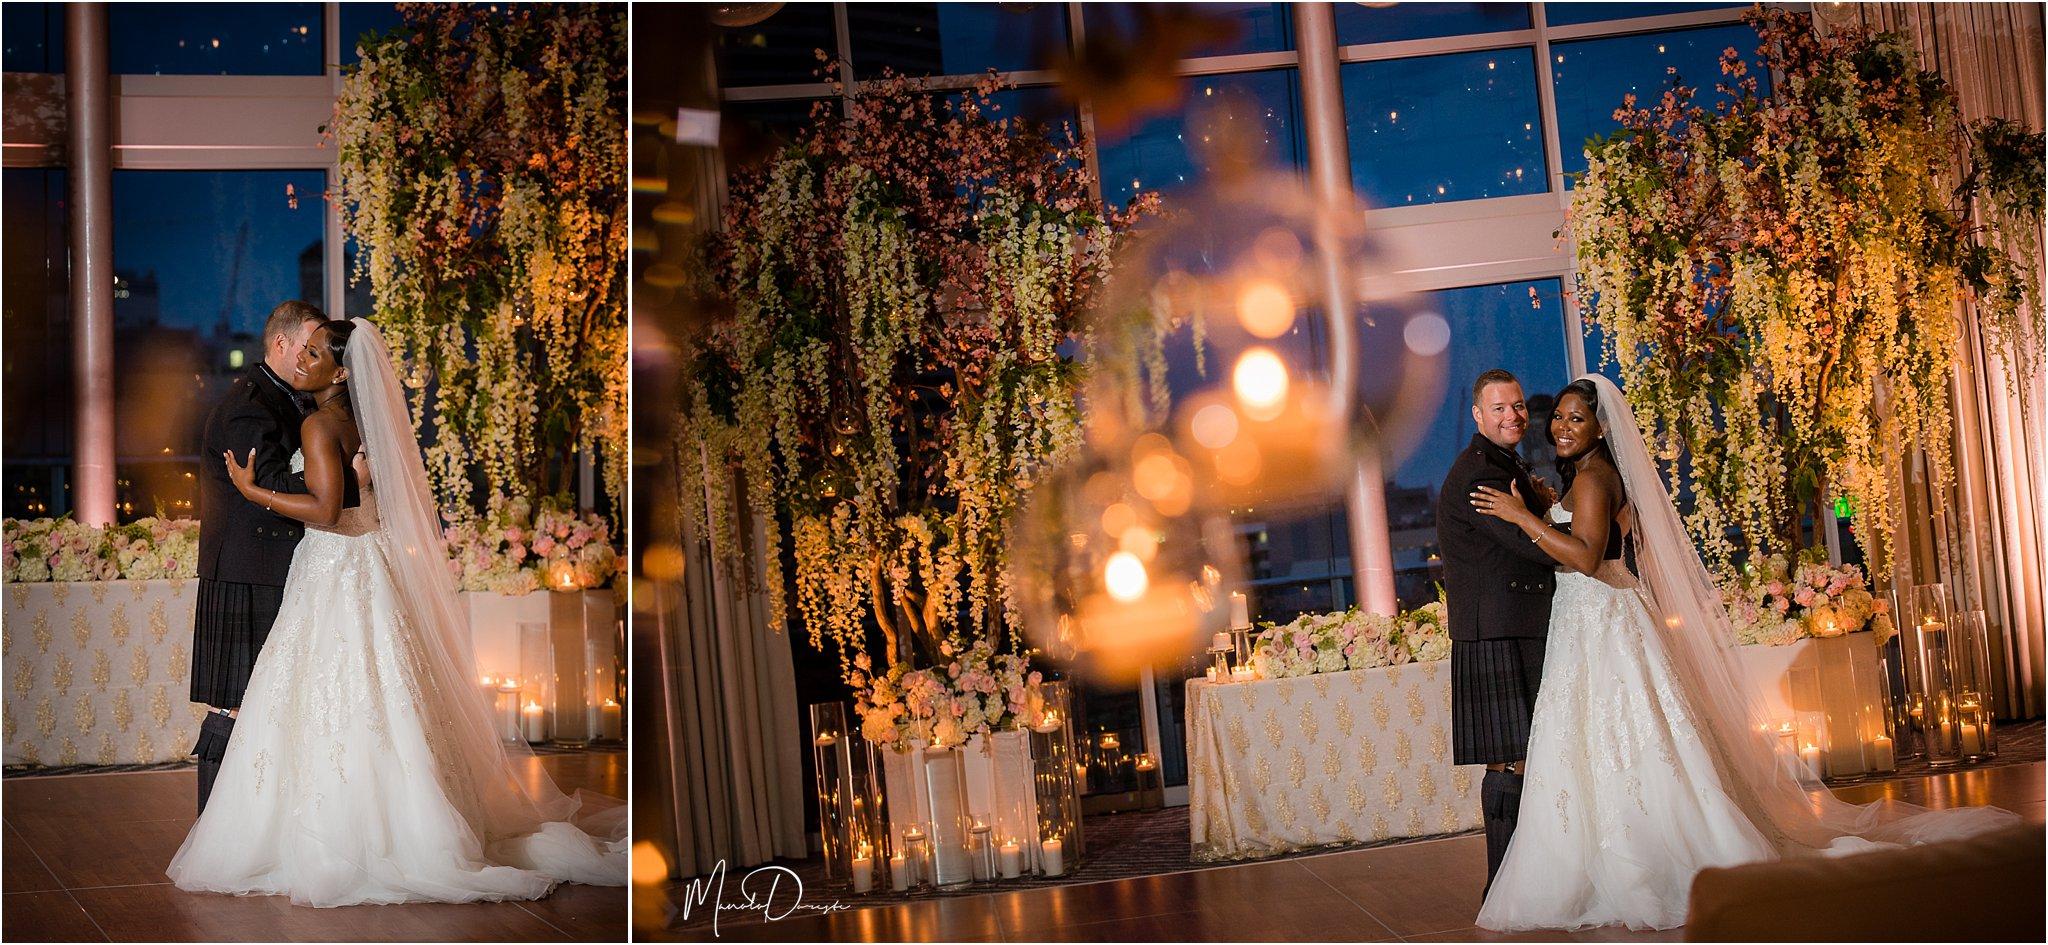 0126_ManoloDoreste_InFocusStudios_Wedding_Family_Photography_Miami_MiamiPhotographer.jpg